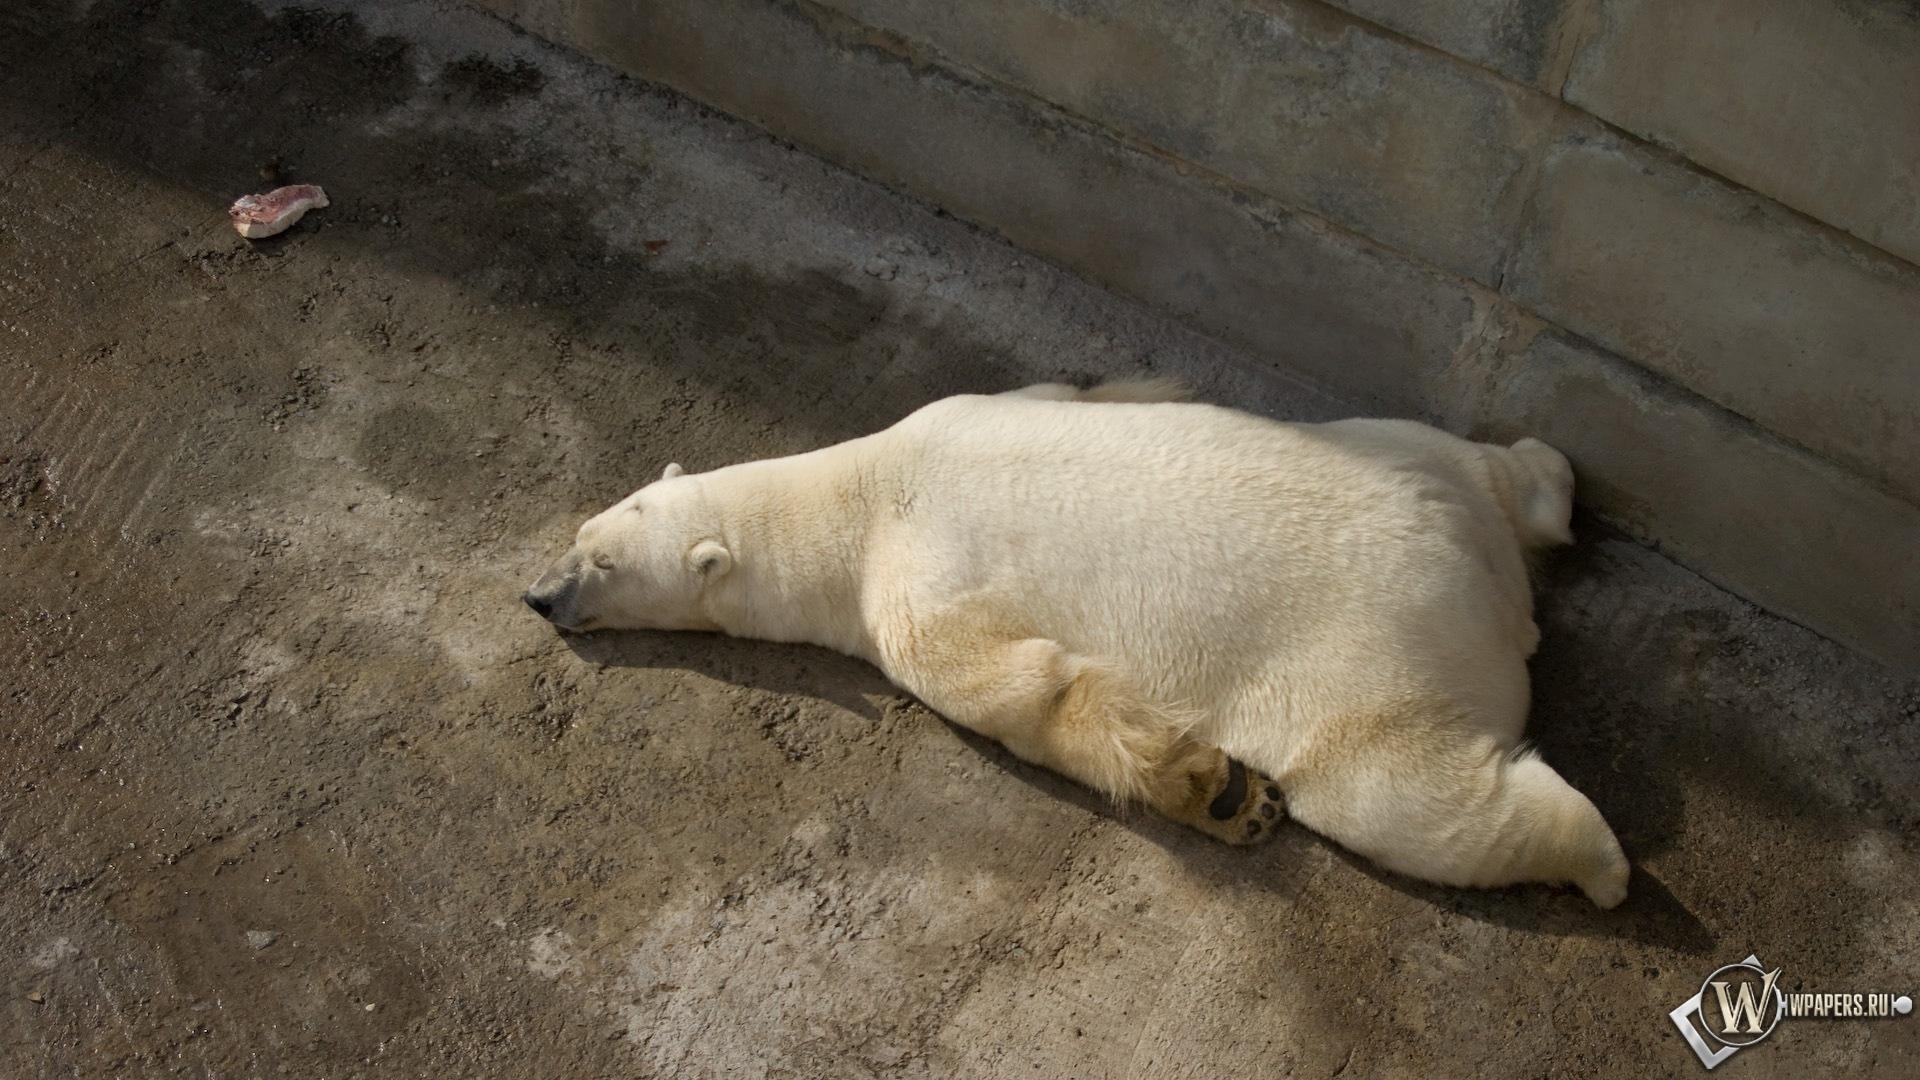 Белый медведь на отдыхе 1920x1080